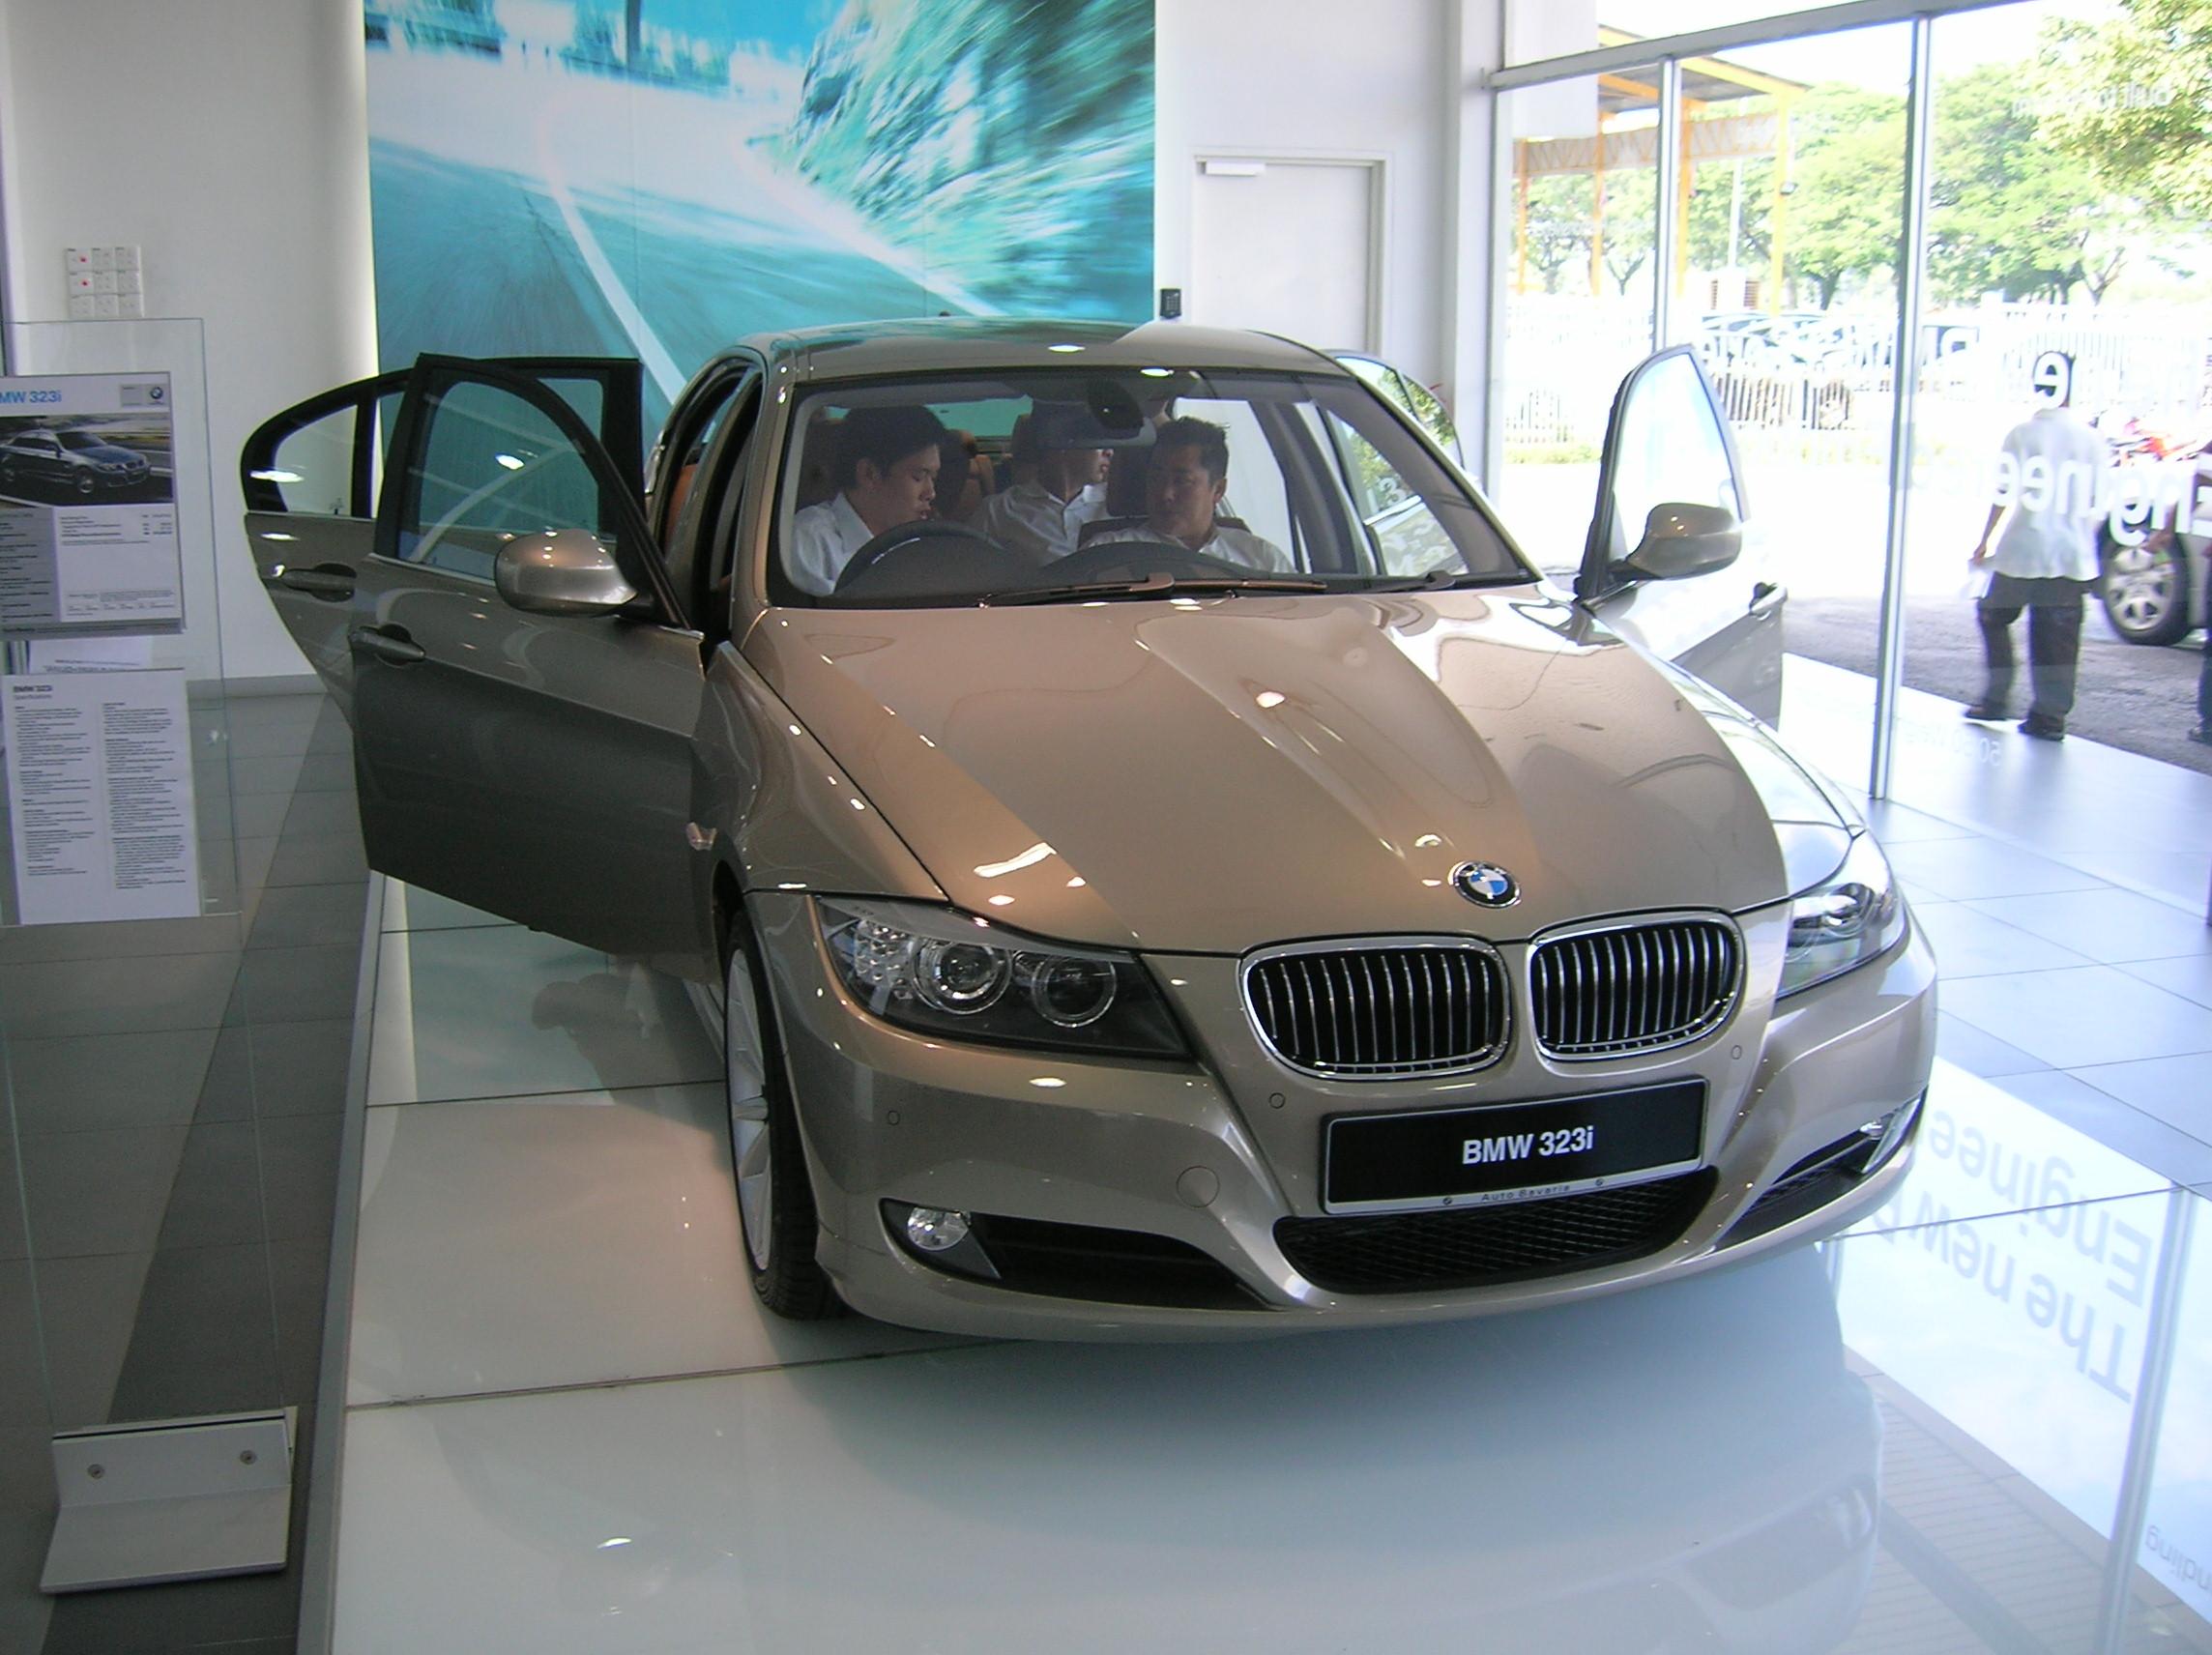 The BMW 323i